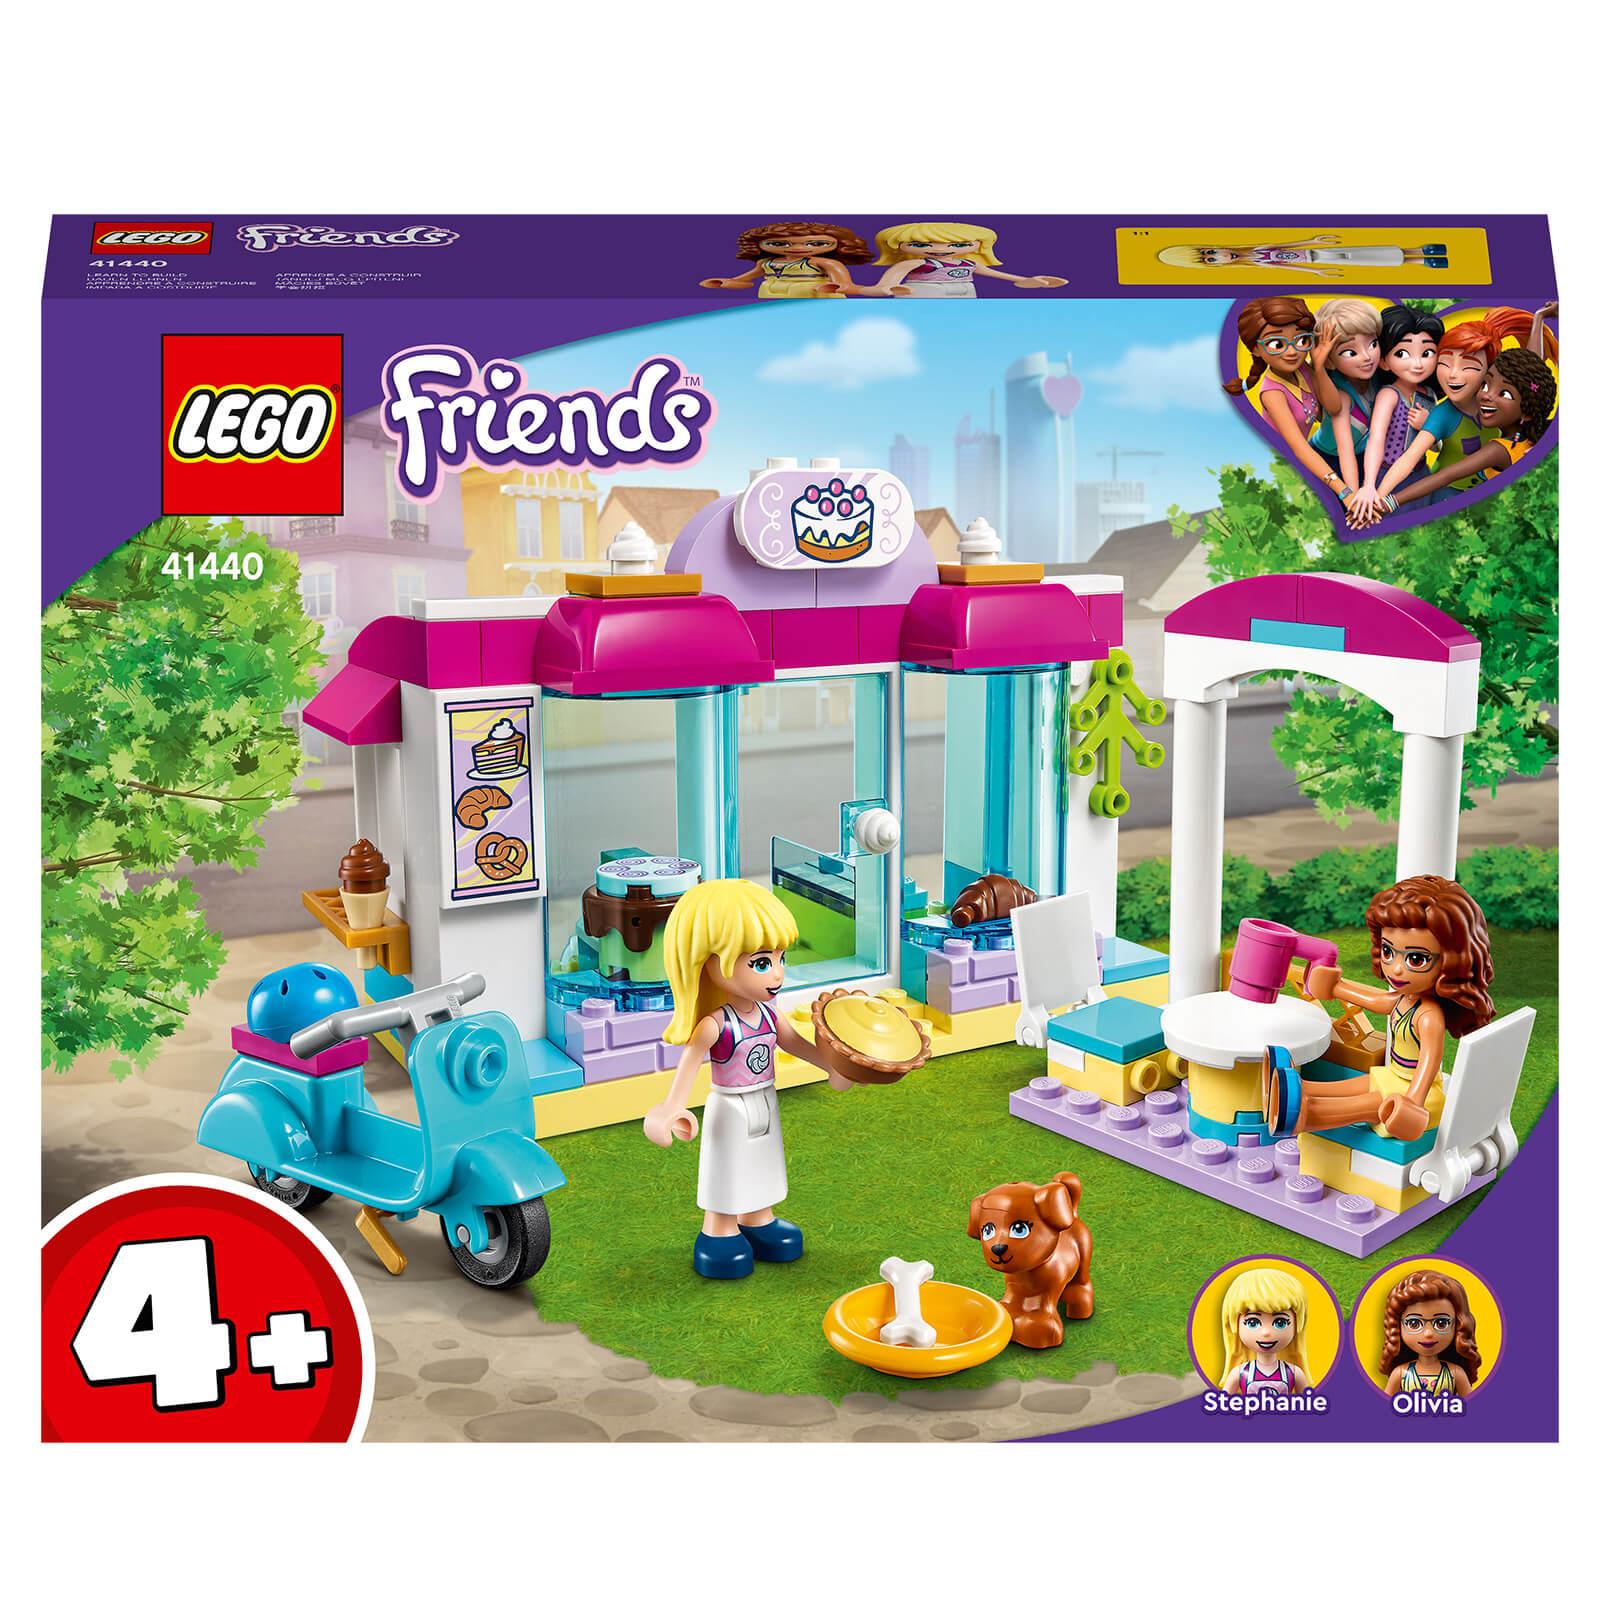 Image of LEGO Friends Heartlake Bakery - 41440